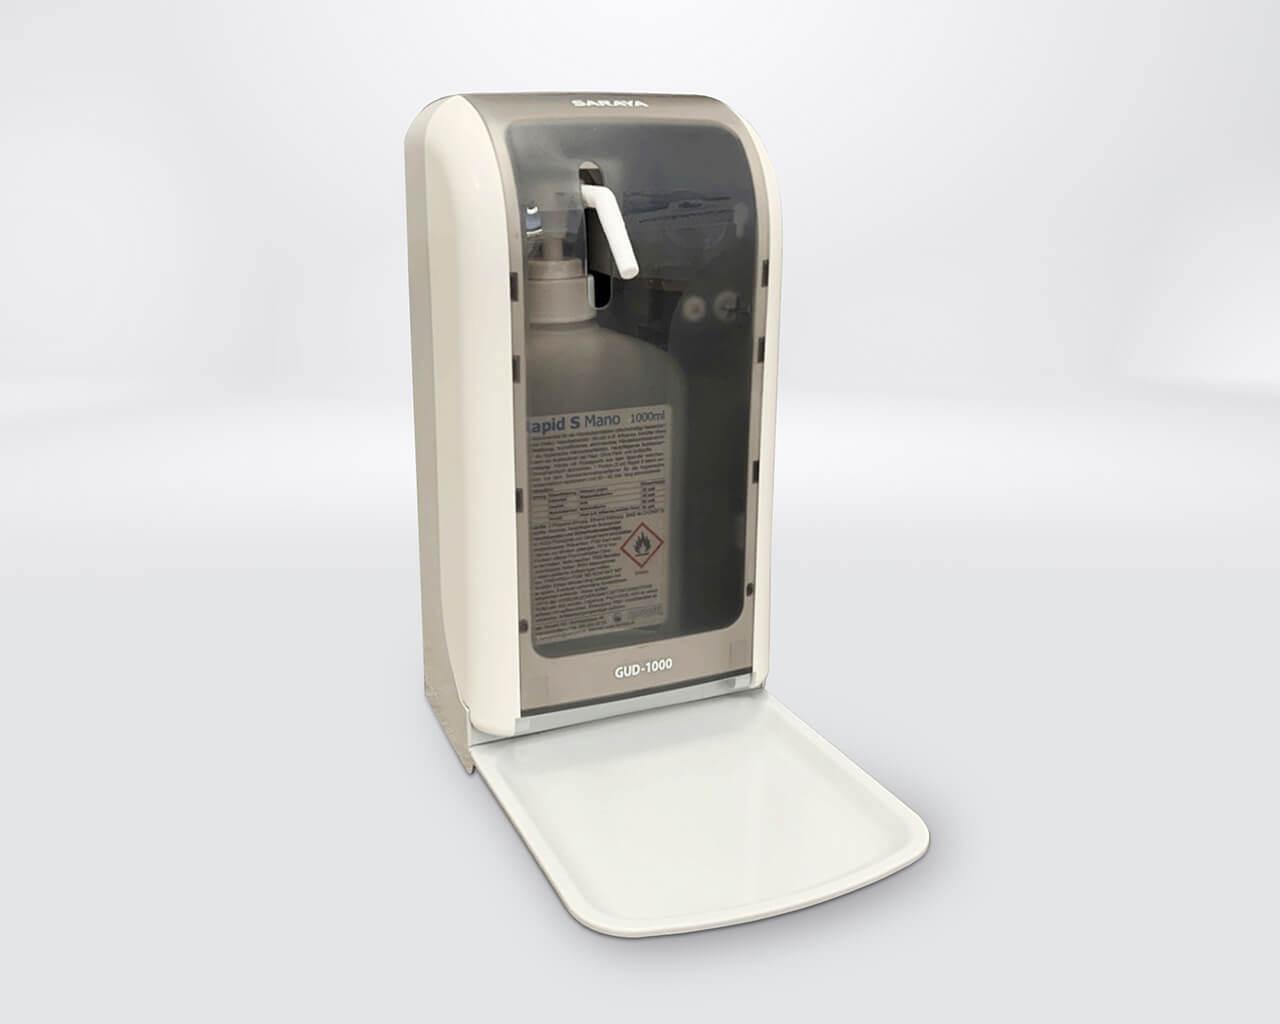 GUD-1000 Sensorspender